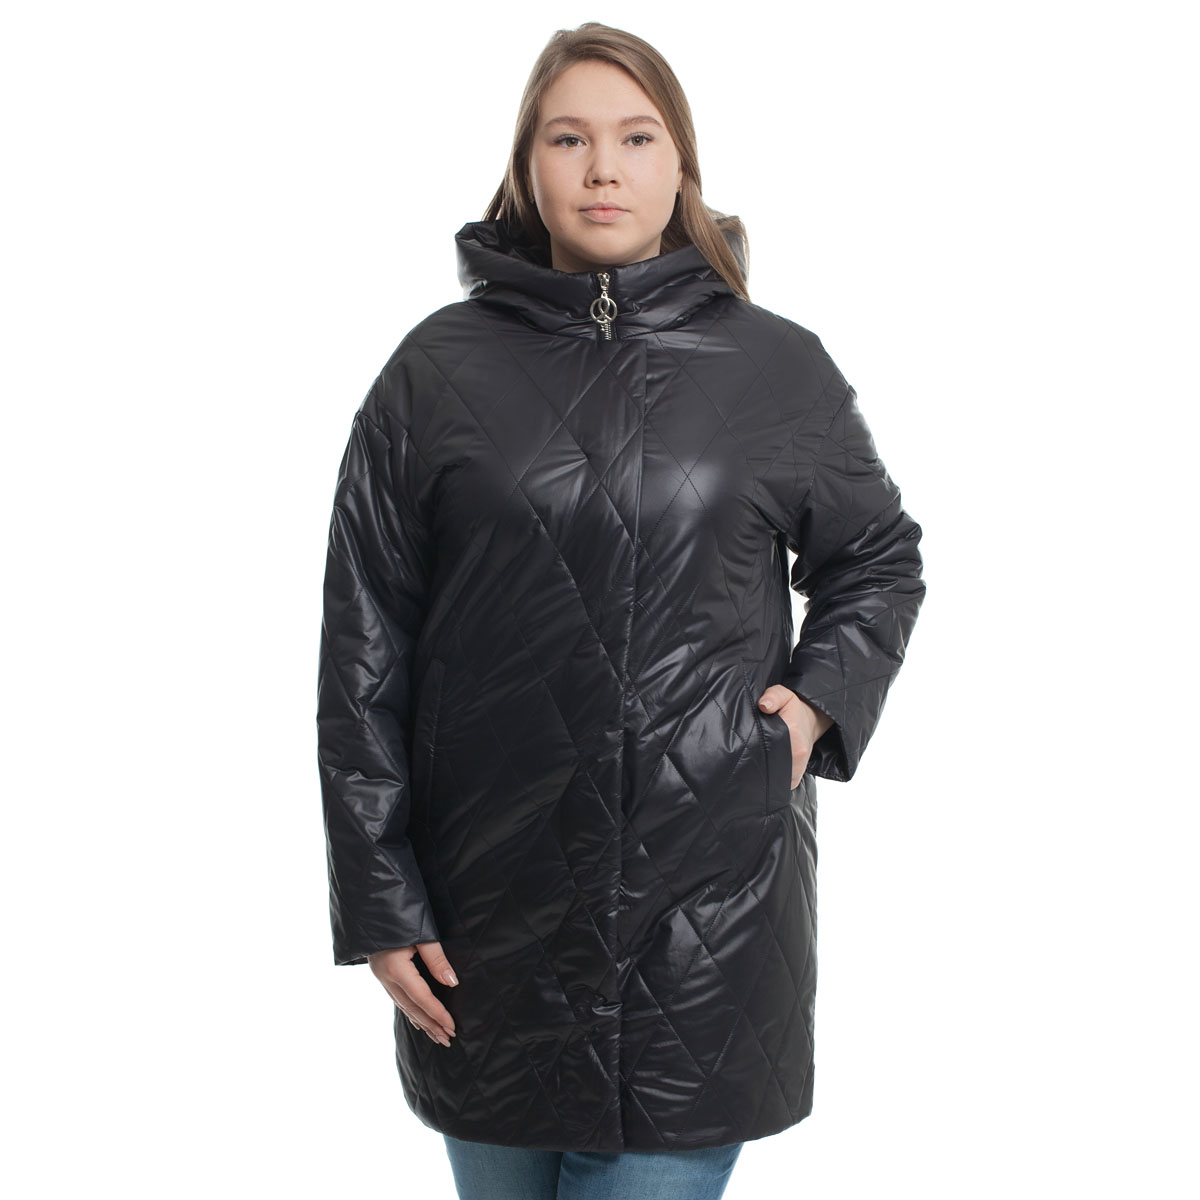 Куртка демисезонная Hannan Liuni, 228